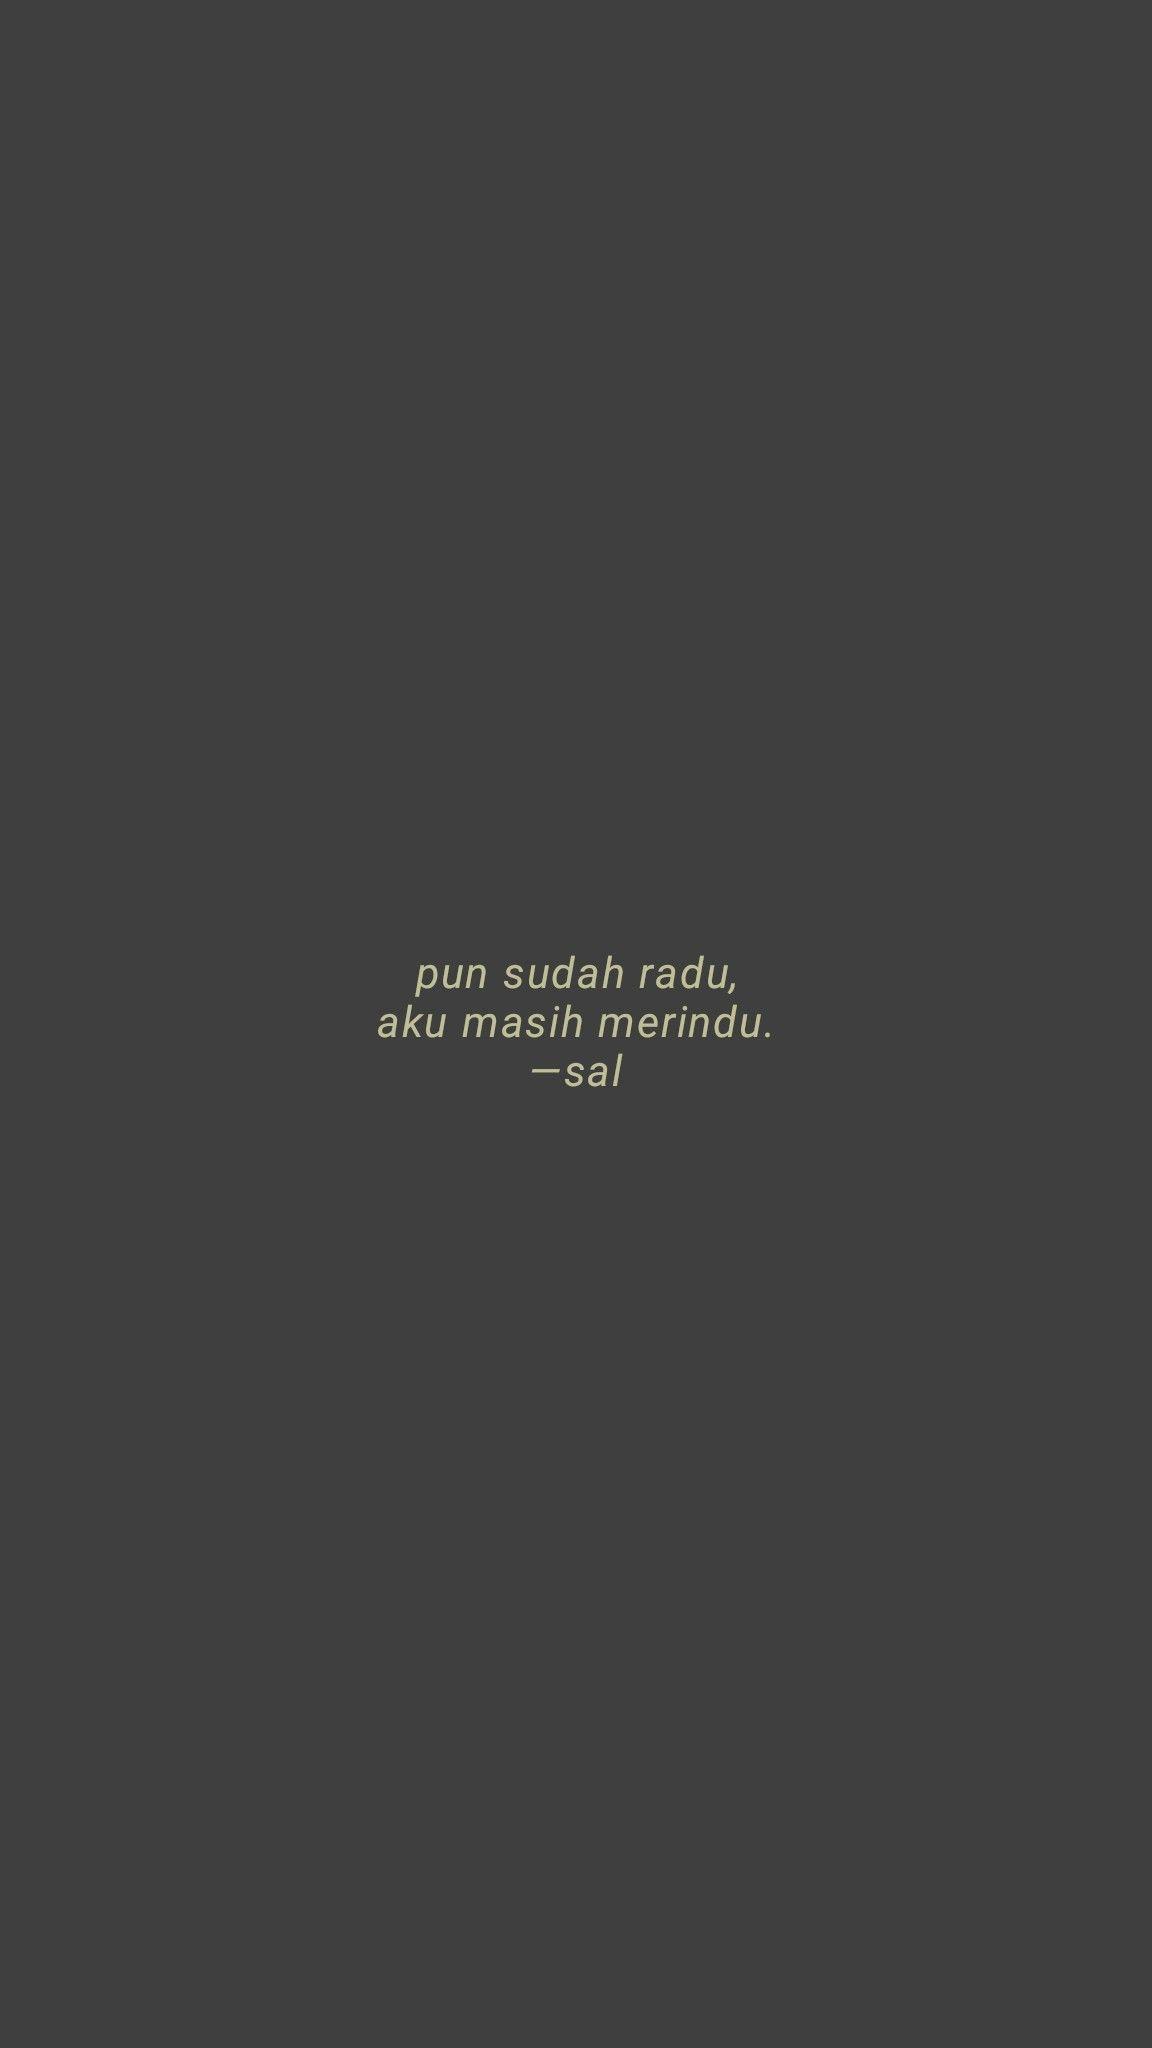 kangen rindu sajak quotes puisi kutipan dalam